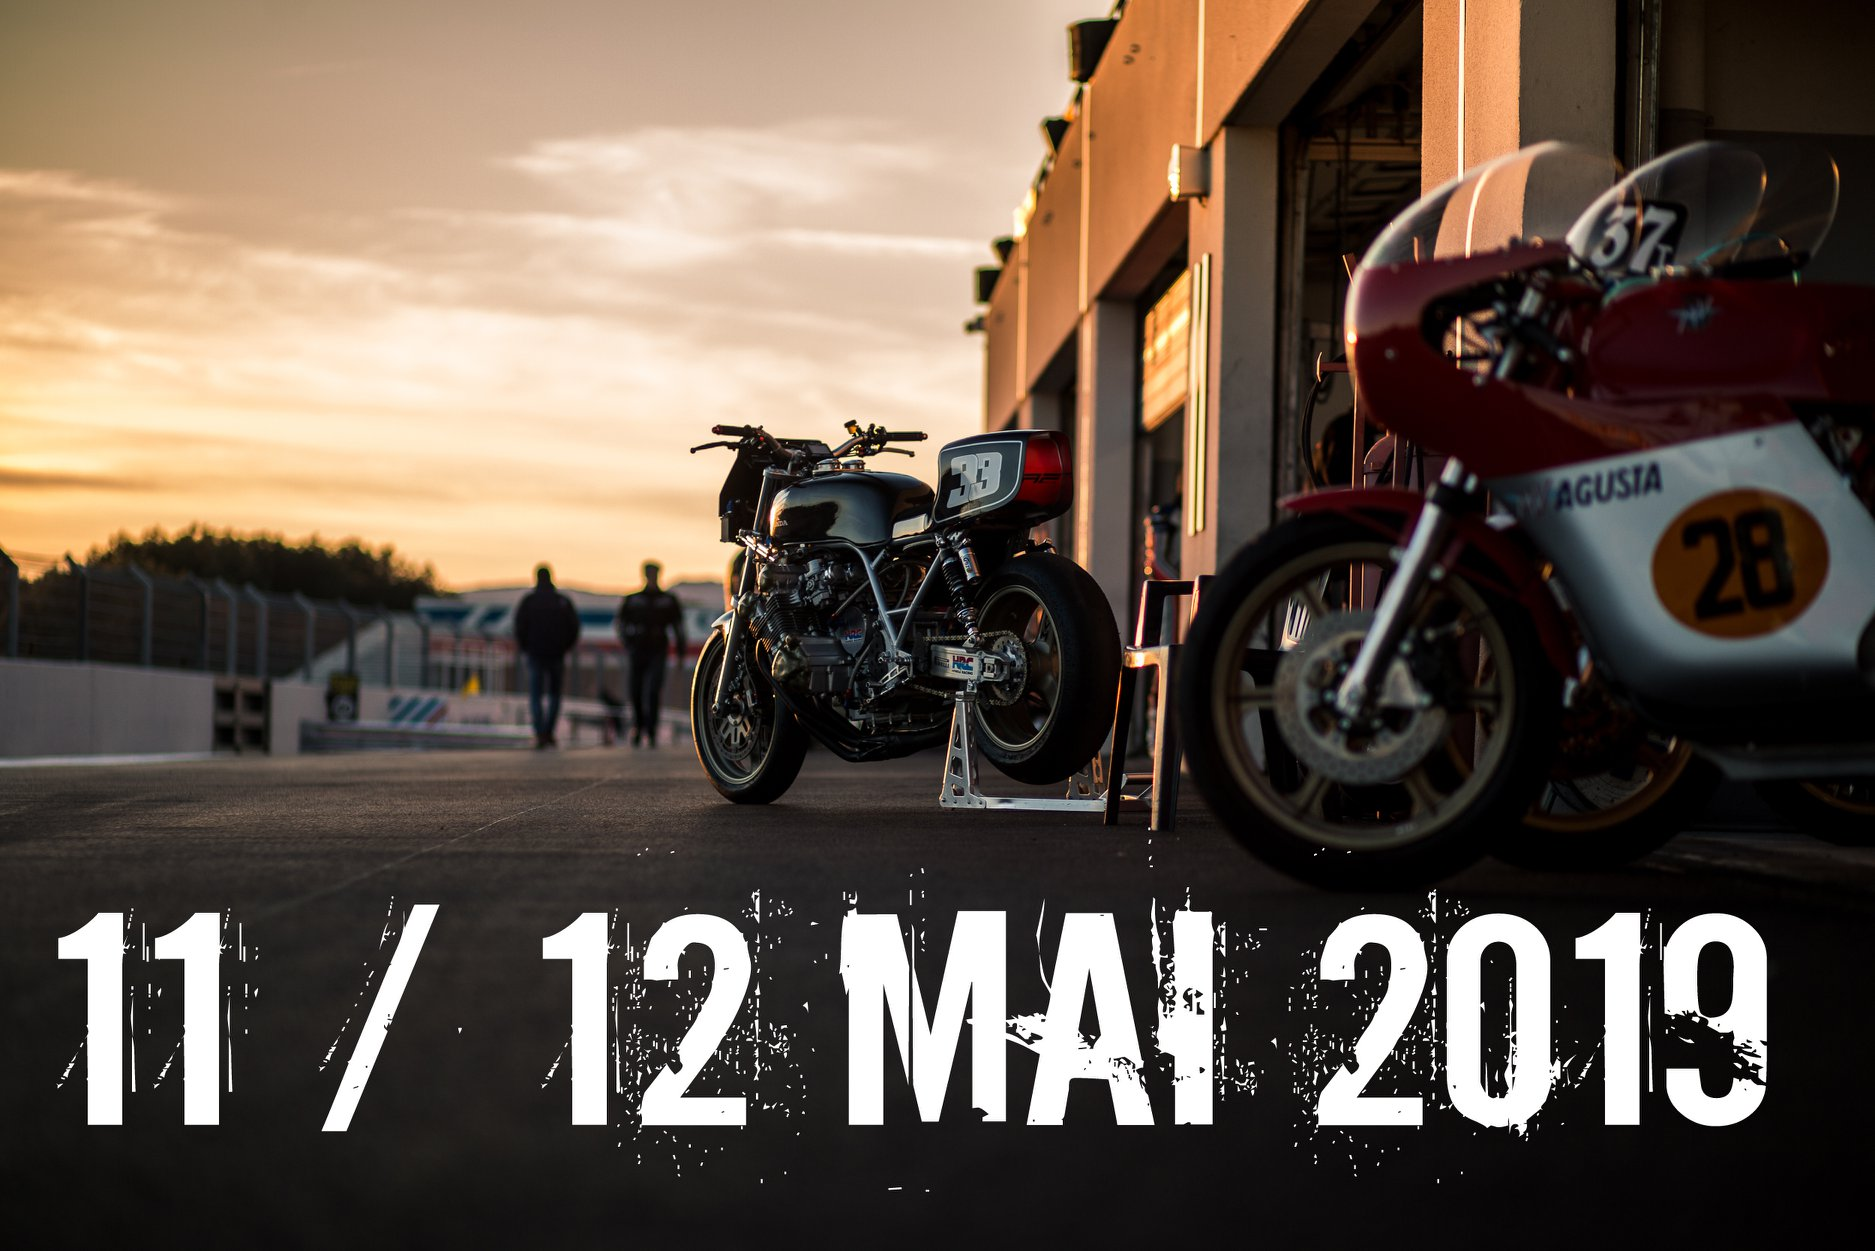 Salon manifestation exposition var paca 83 Auto Moto Bateau Vintage